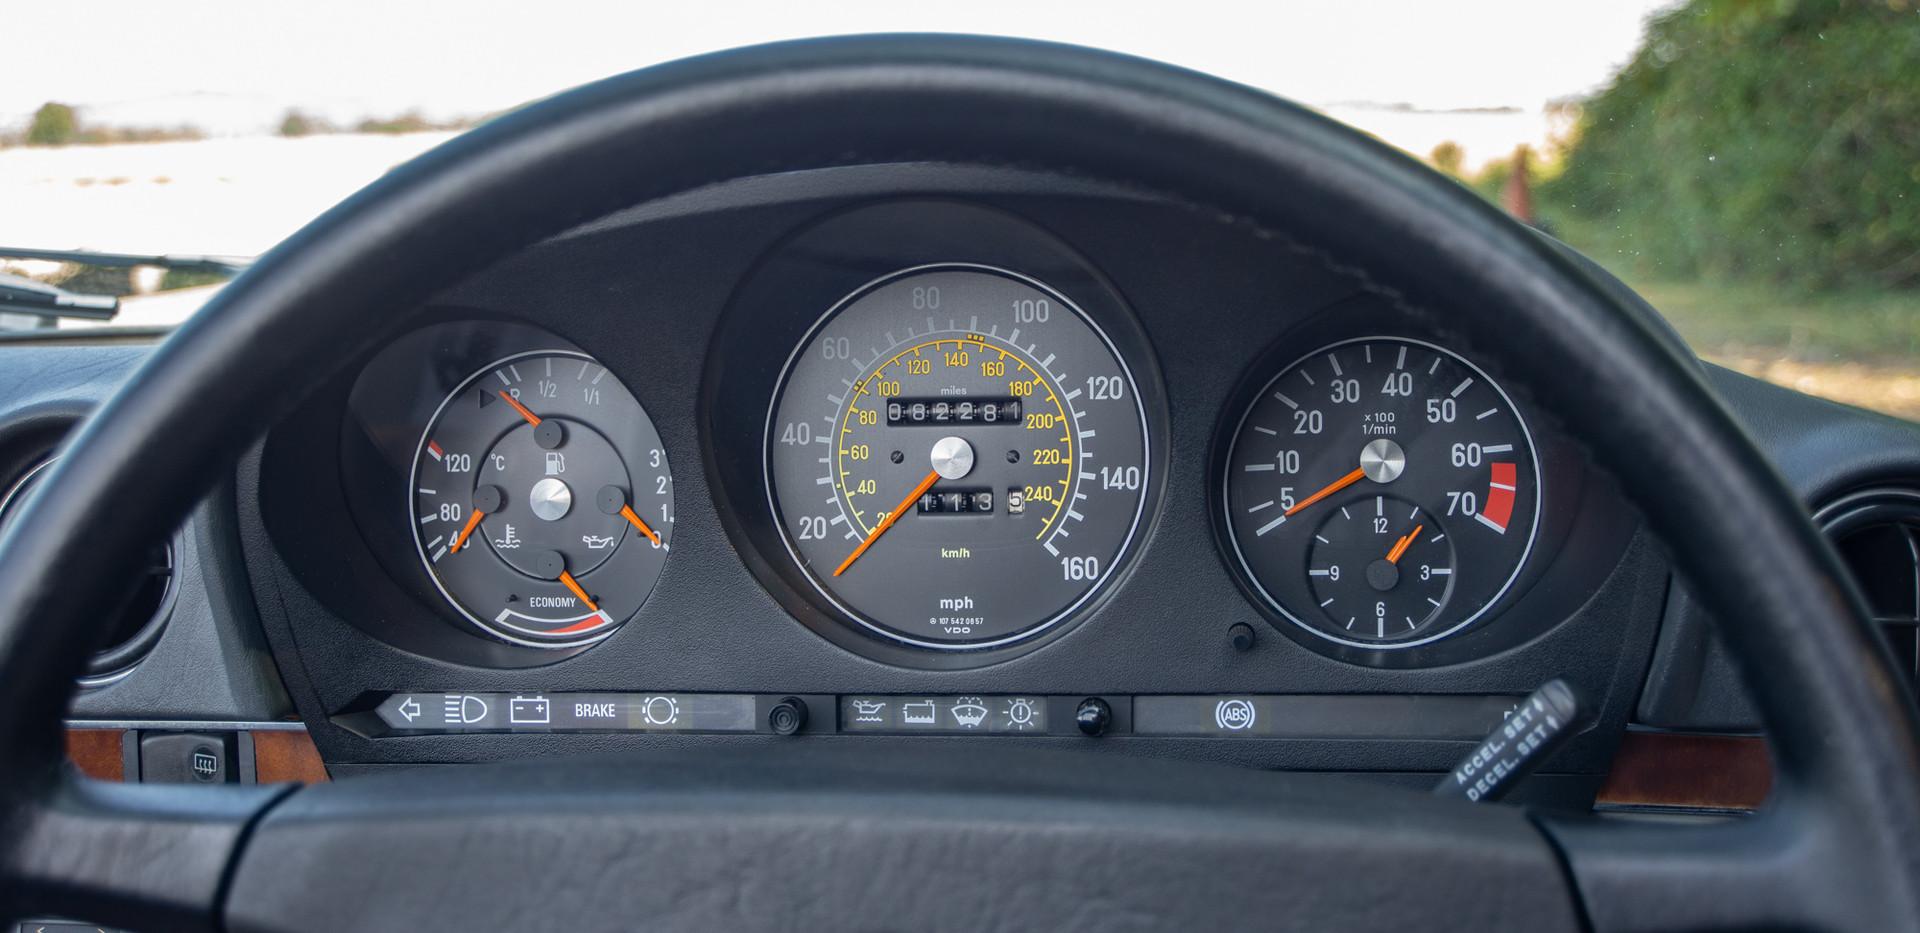 R107 300SL - Uk for sale london-33.jpg